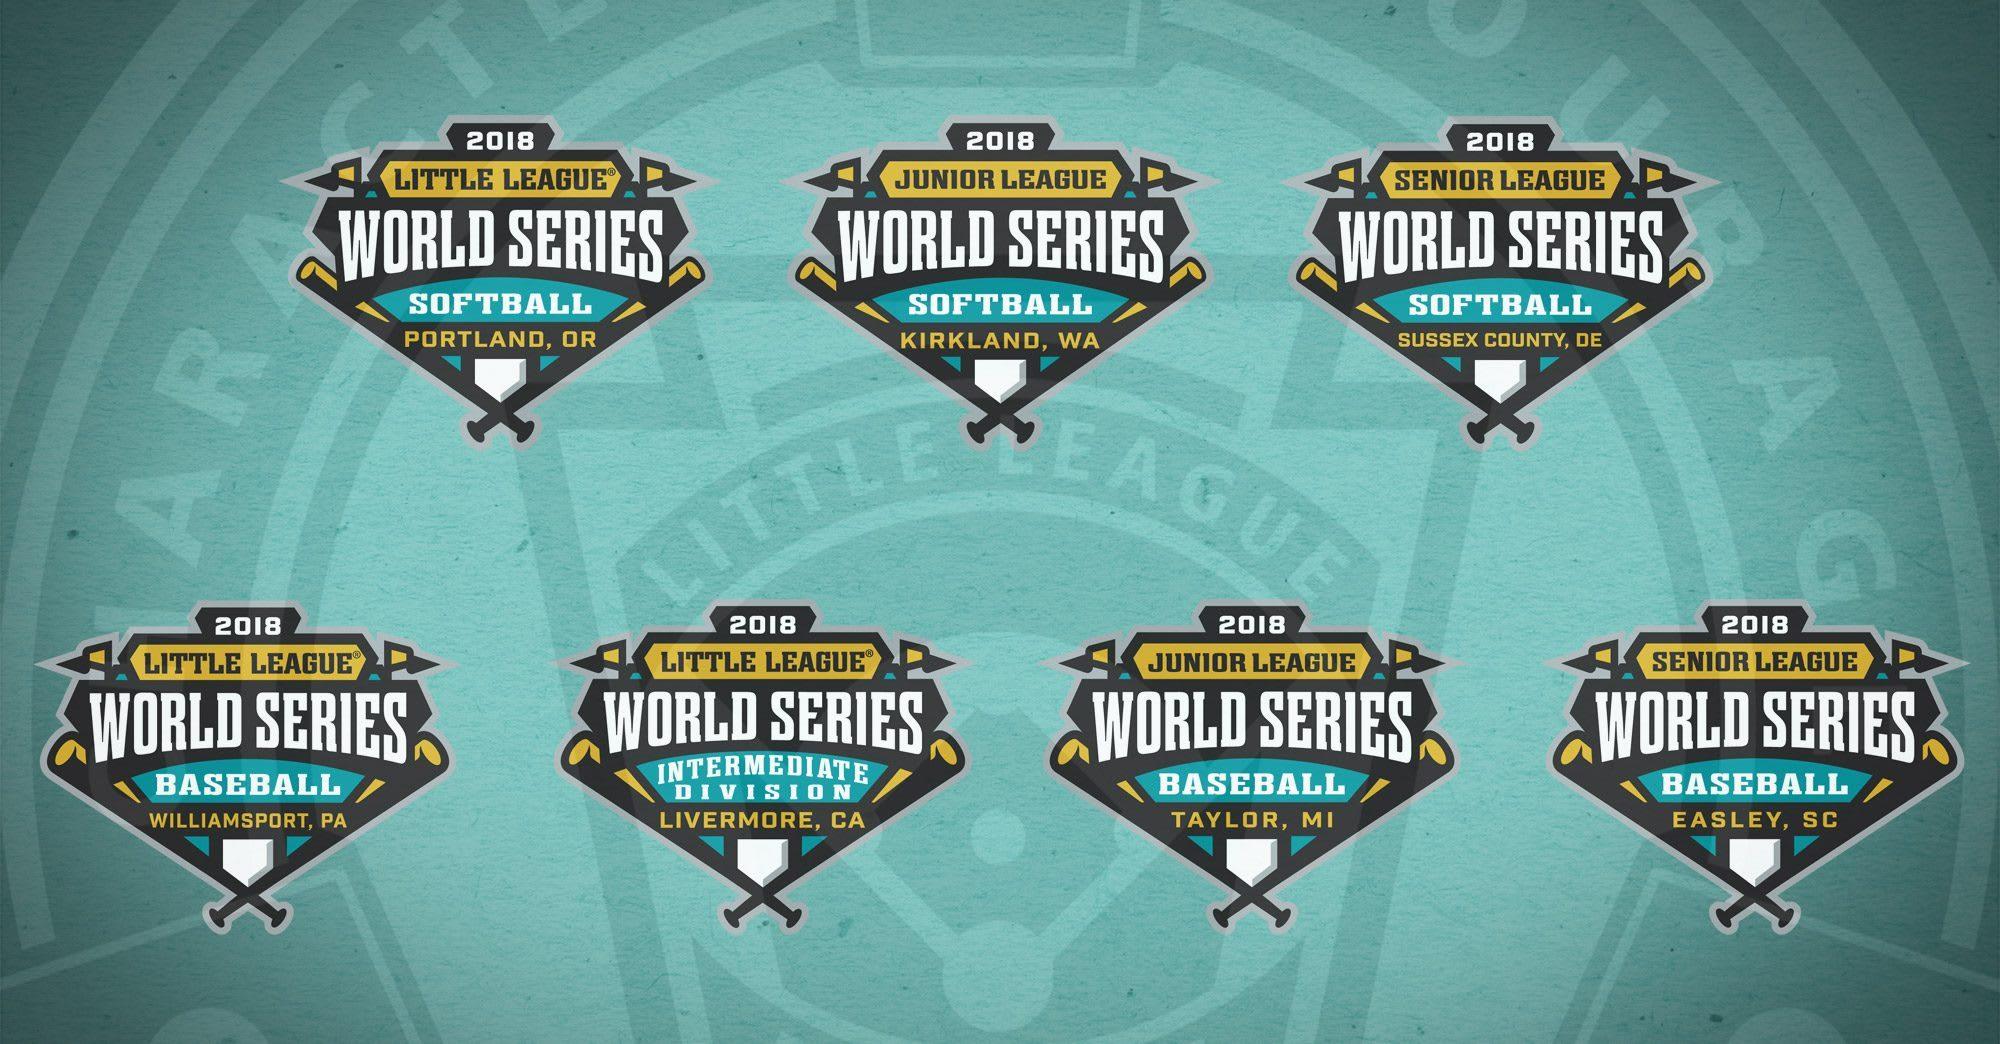 2018 little league174 world series logos unveiled little